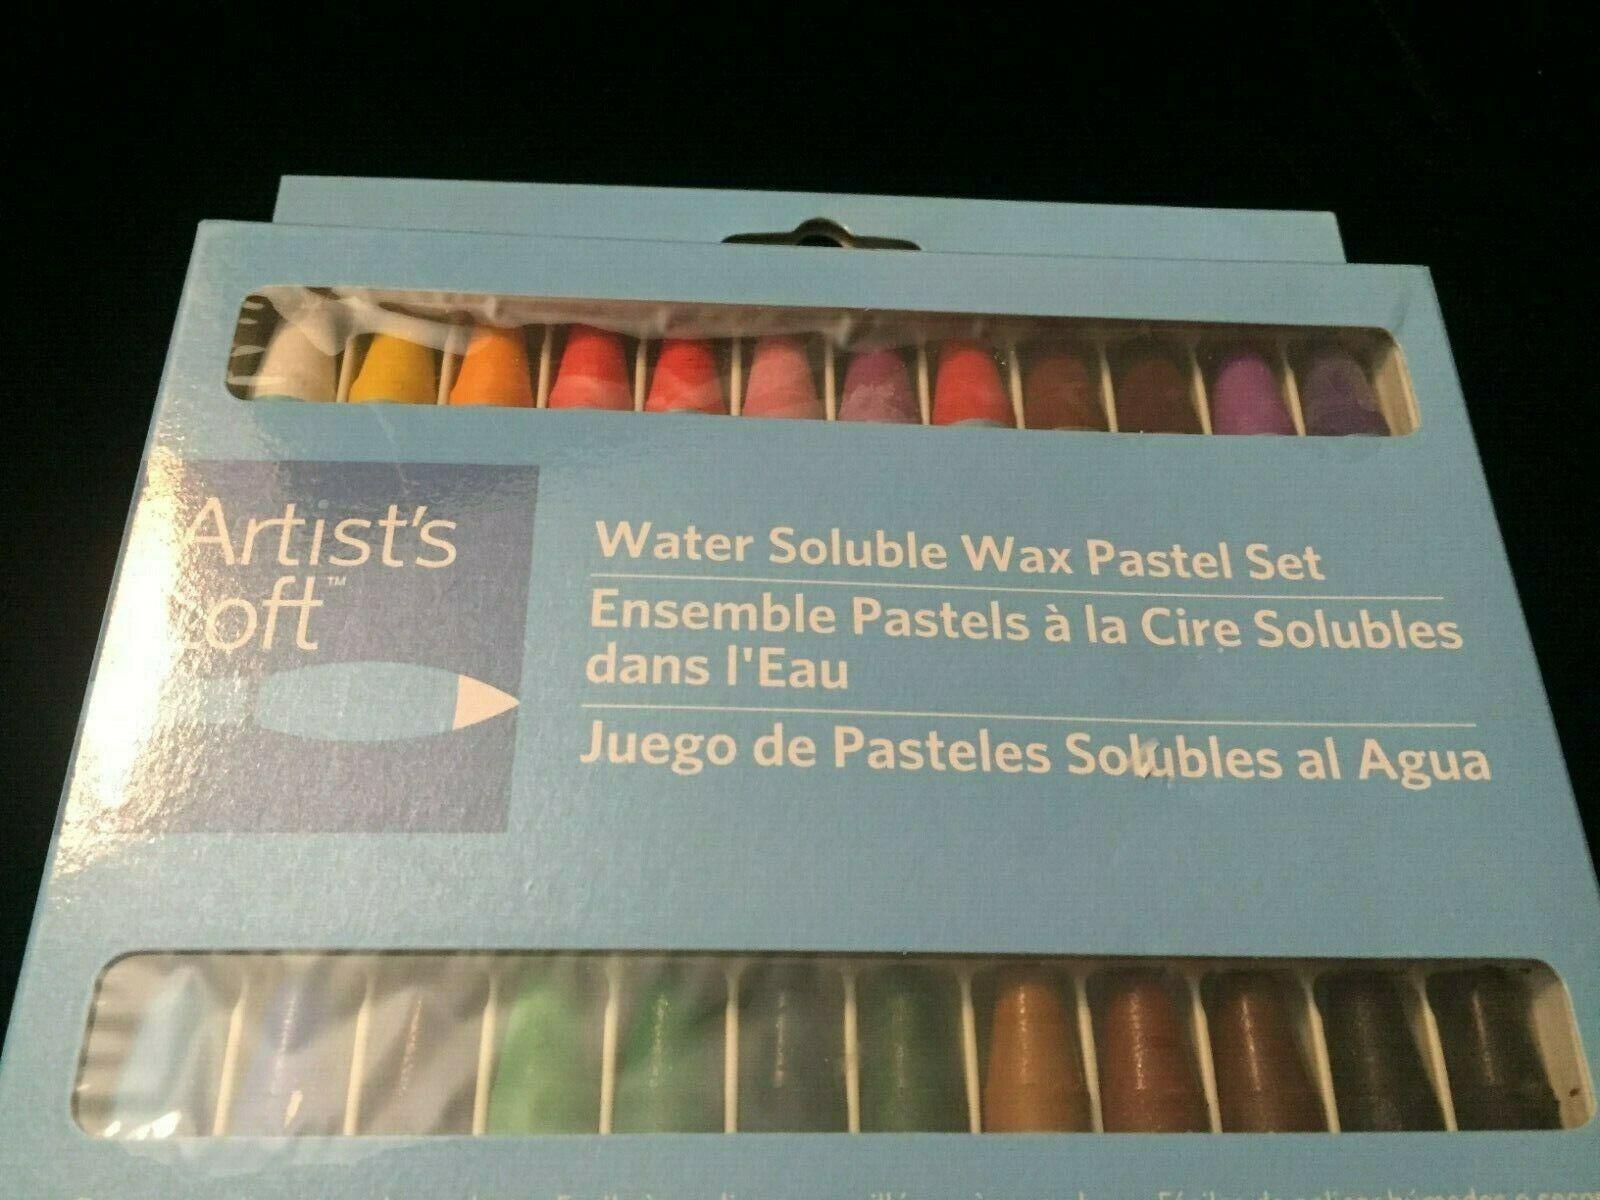 NEW Artist s Loft Water Soluble Wax Pastel Set 24 Pc.  - $5.99